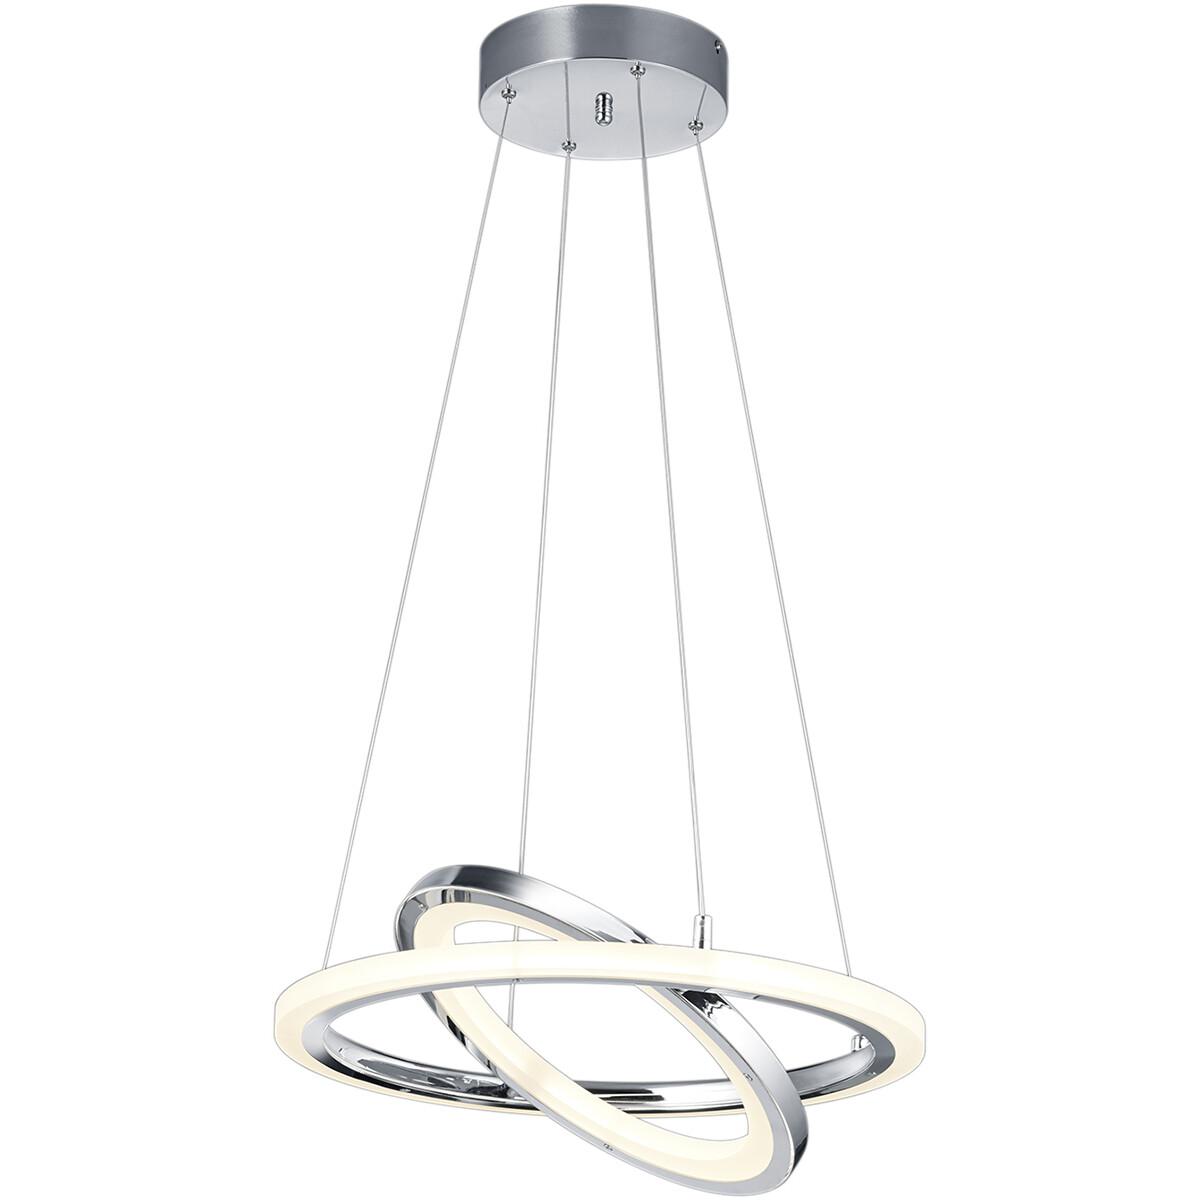 LED Hanglamp - Hangverlichting - Trion Sotaru - 36W - Warm Wit 3000K - Rond - Glans Chroom - Aluminium